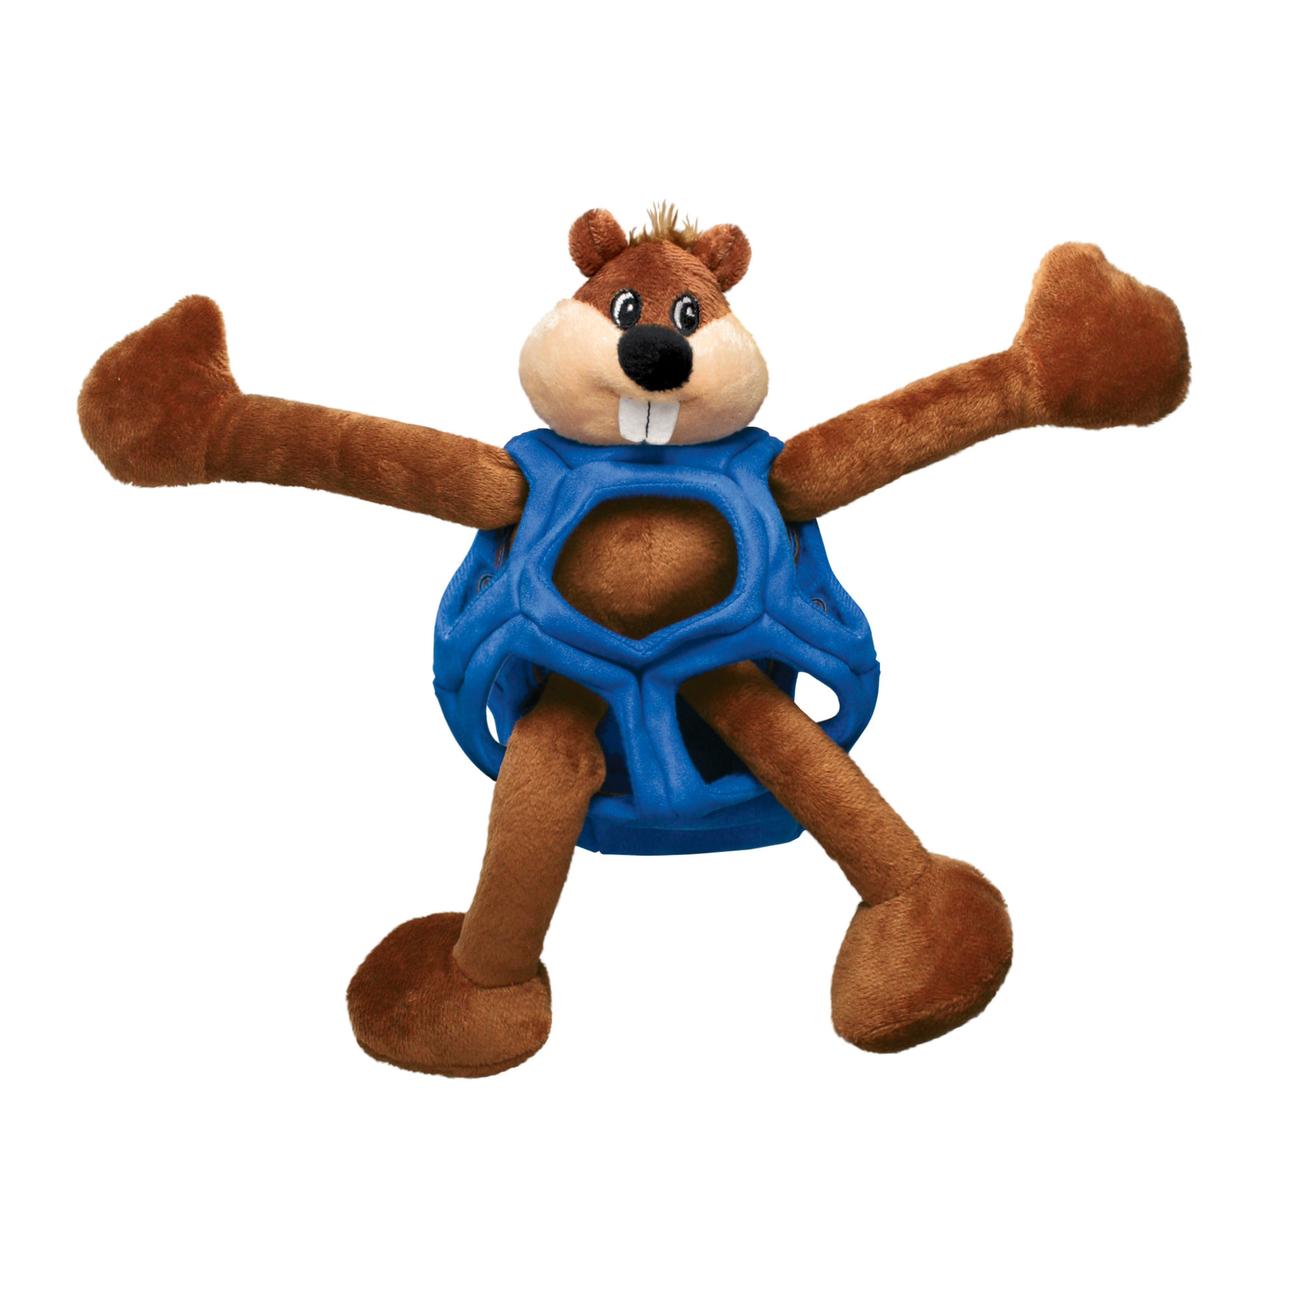 KONG Puzzlements Hundespielzeug, Bild 3